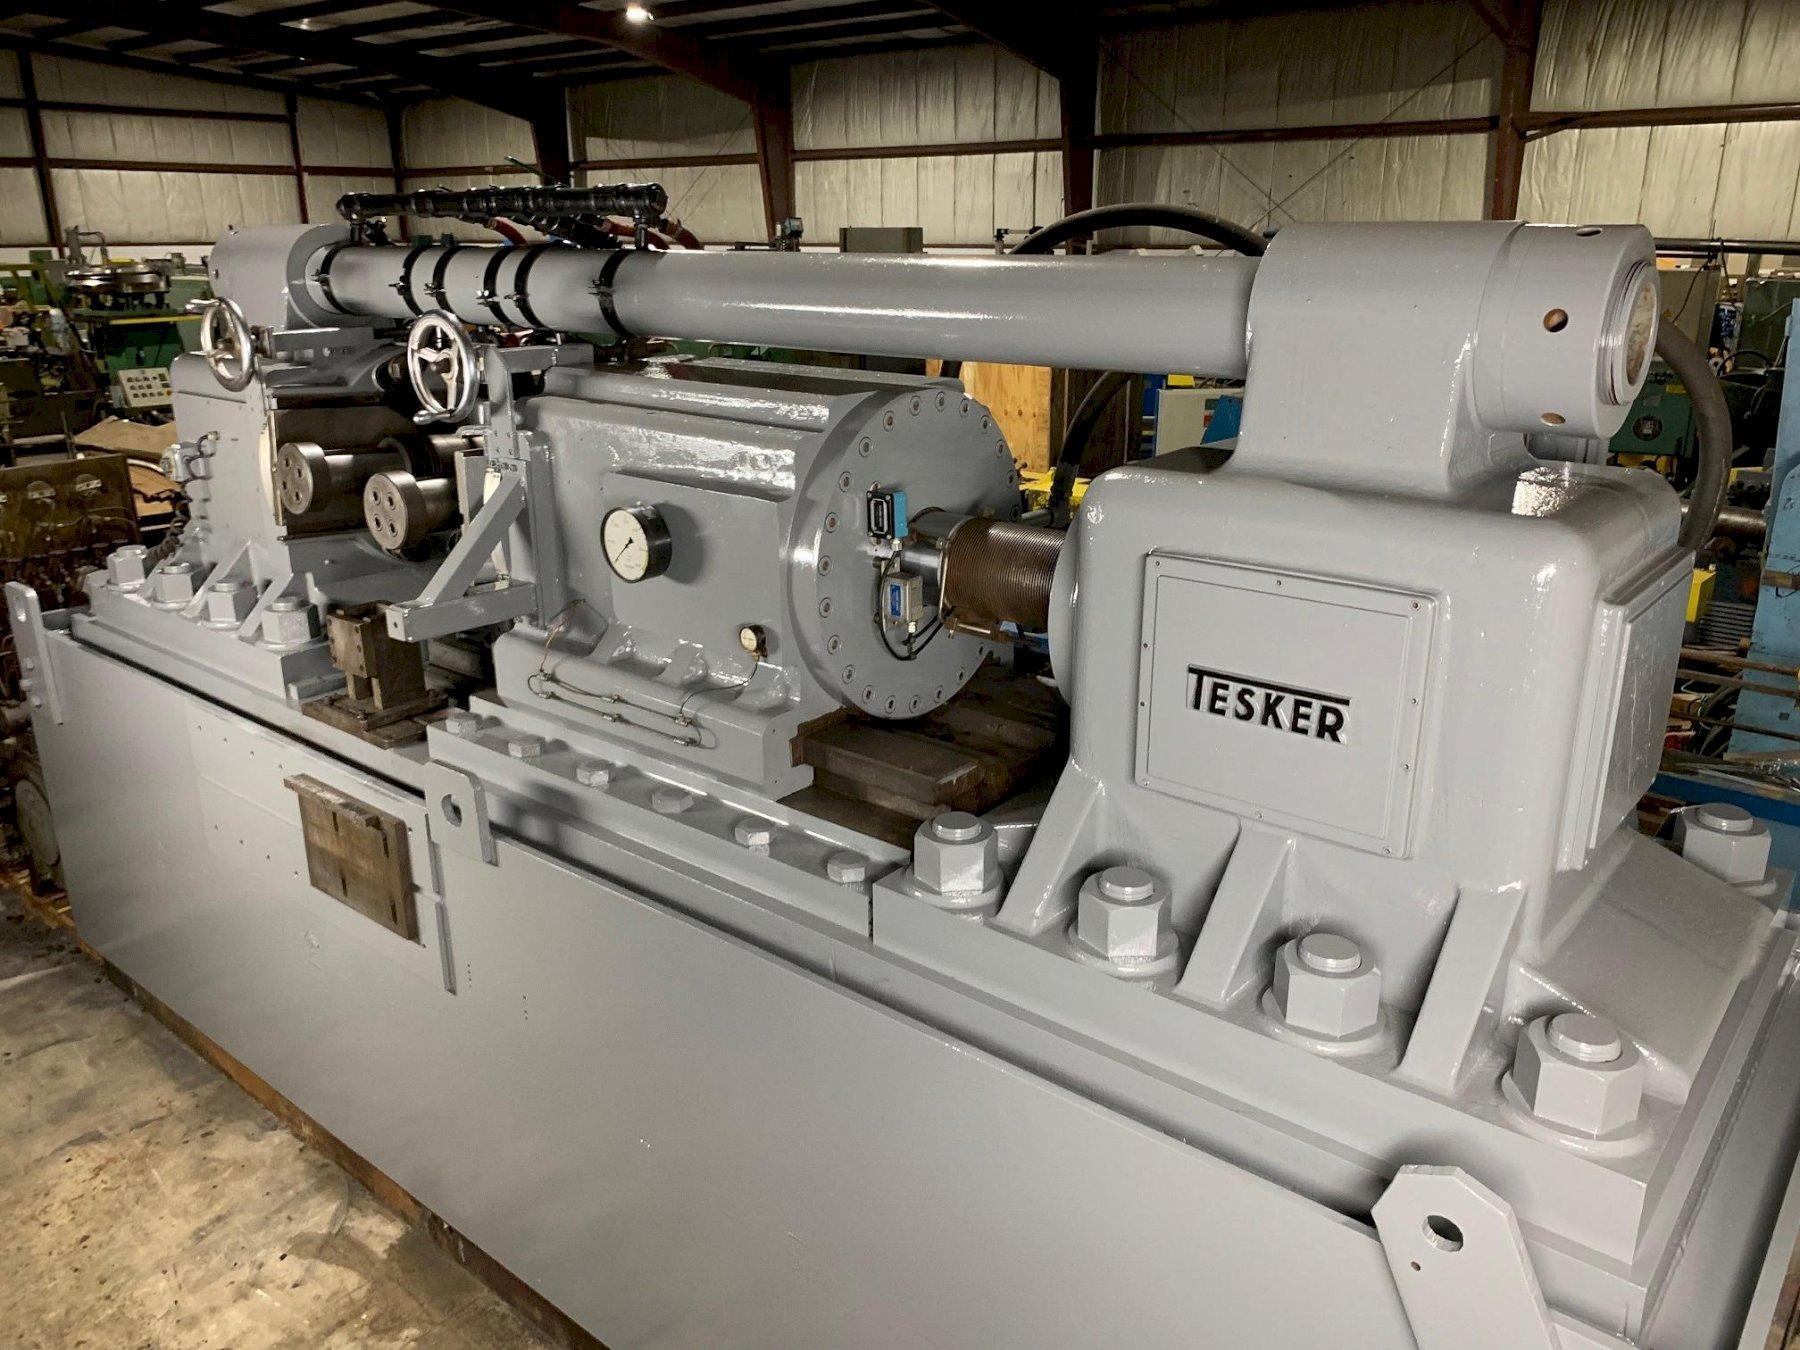 Tesker 840 Thread Roller